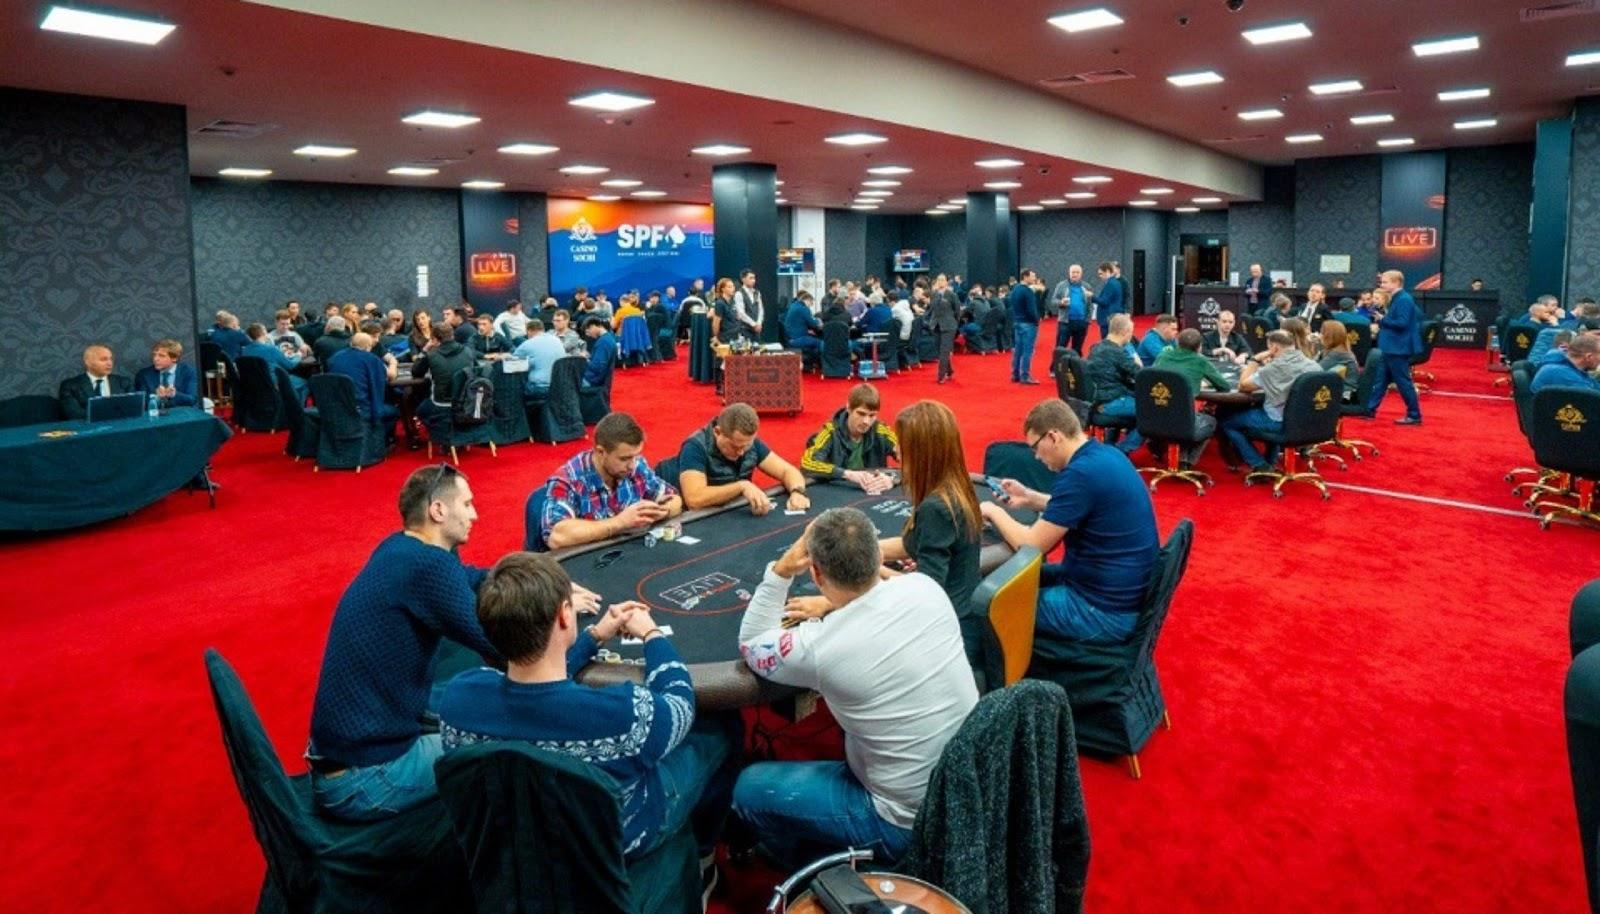 В «Казино Сочи» стартует Sochi Poker Festival Spring - Timelottery